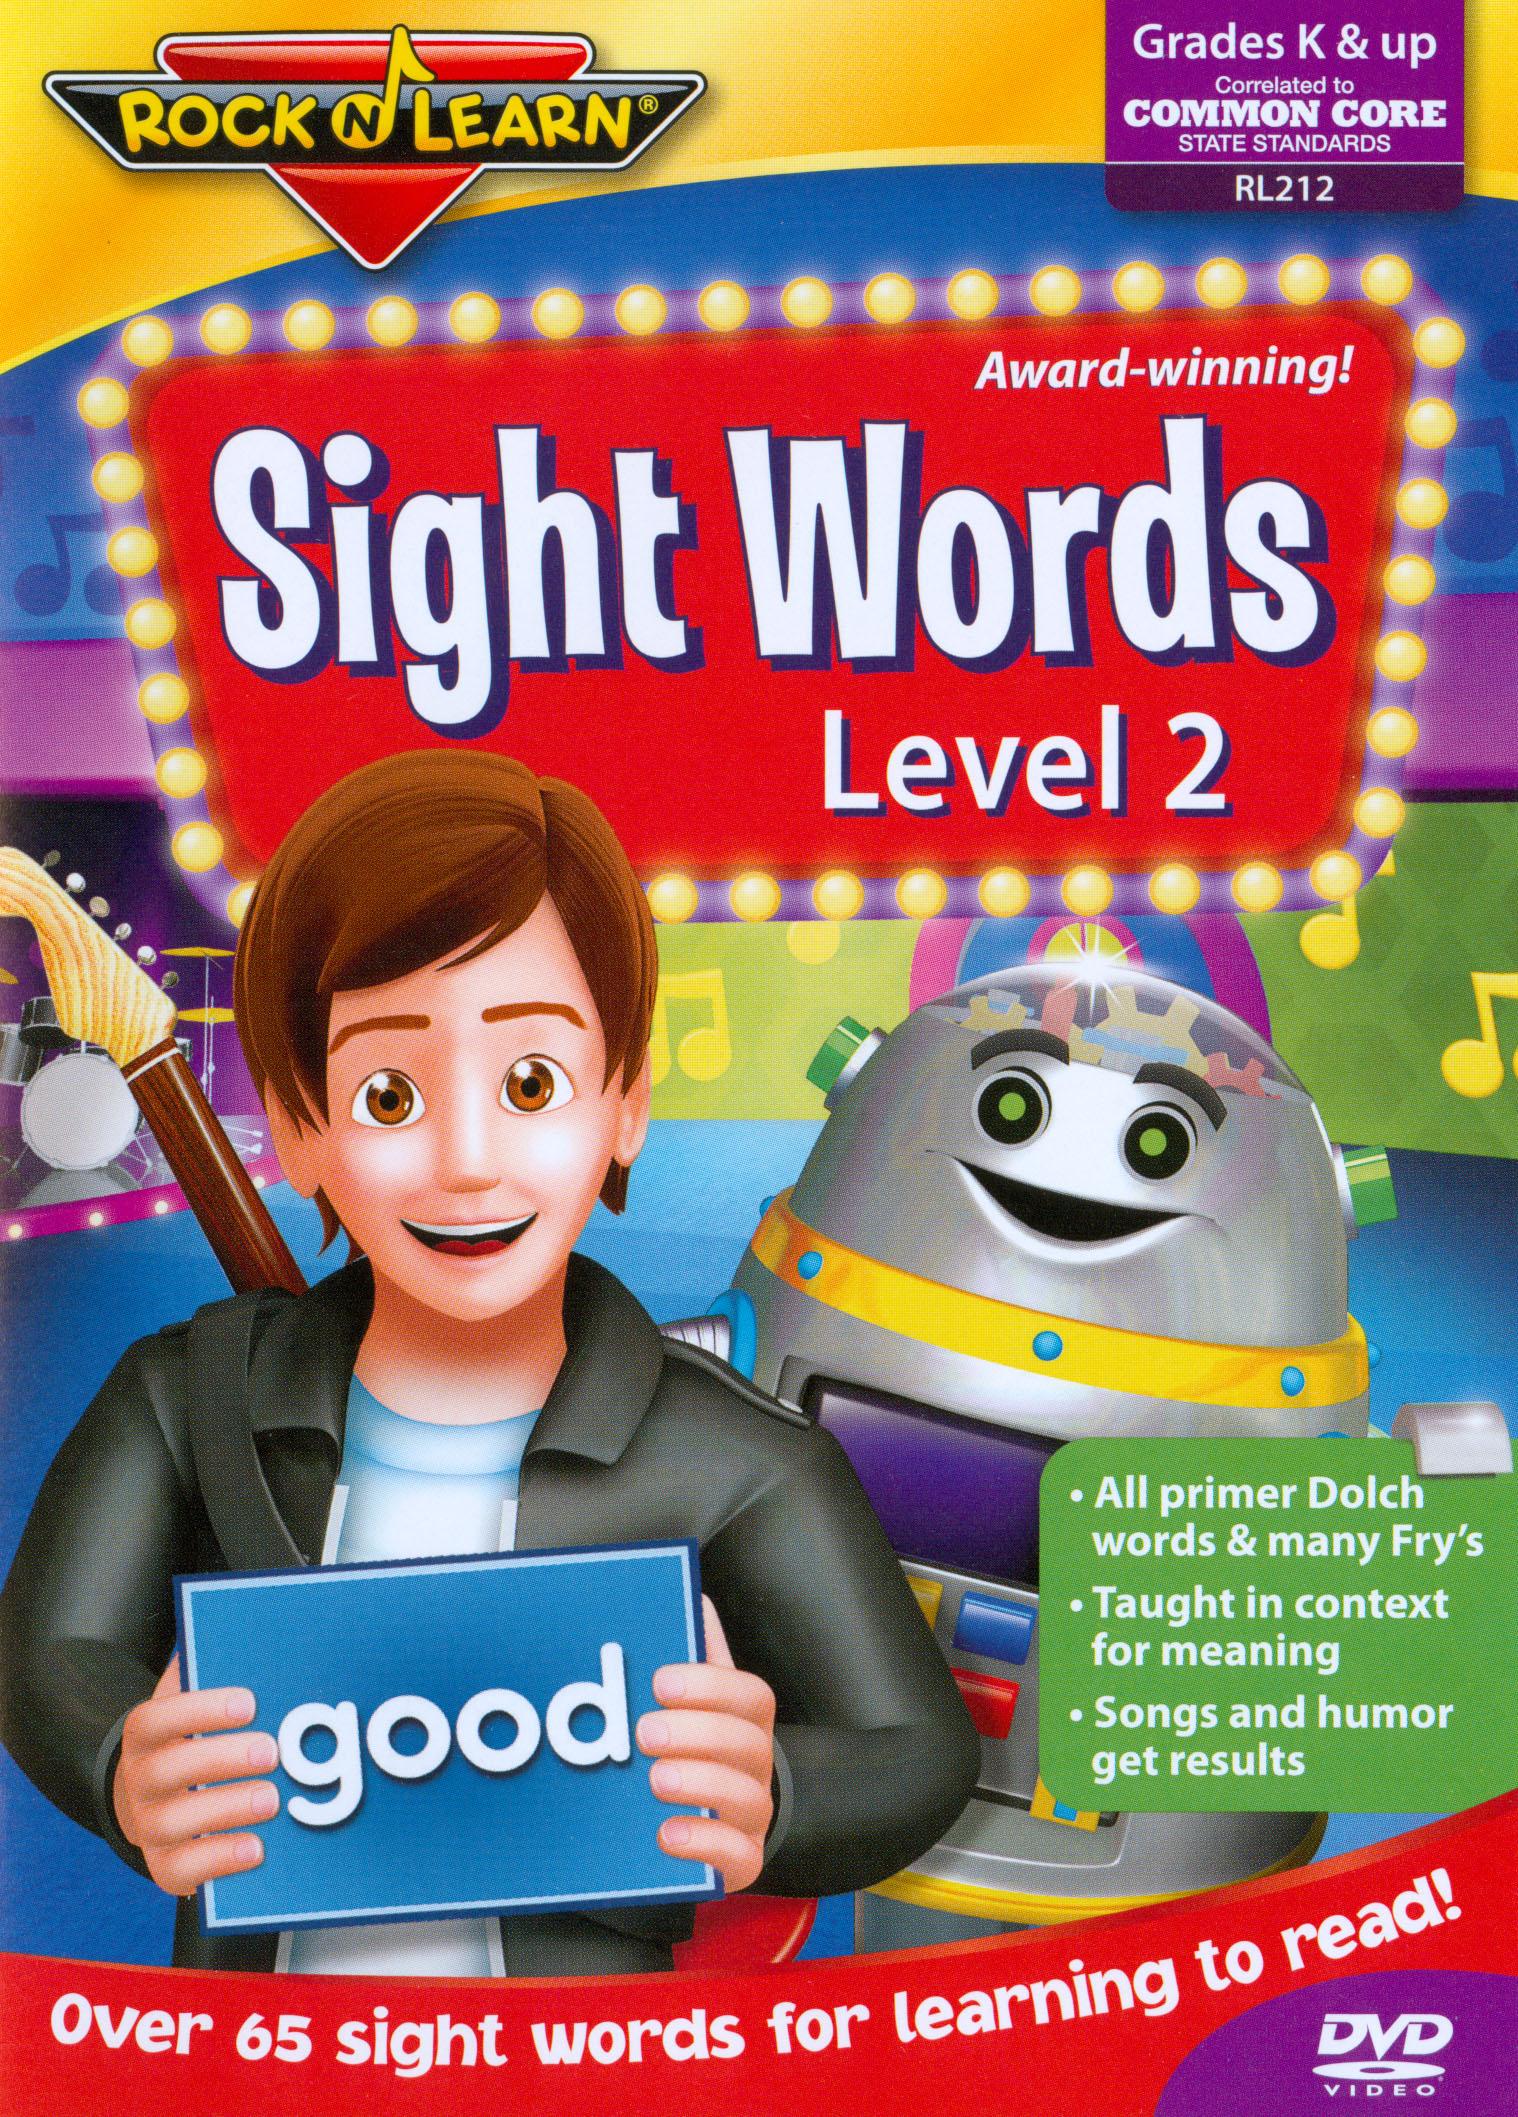 Rock 'N Learn: Sight Words - Level 2